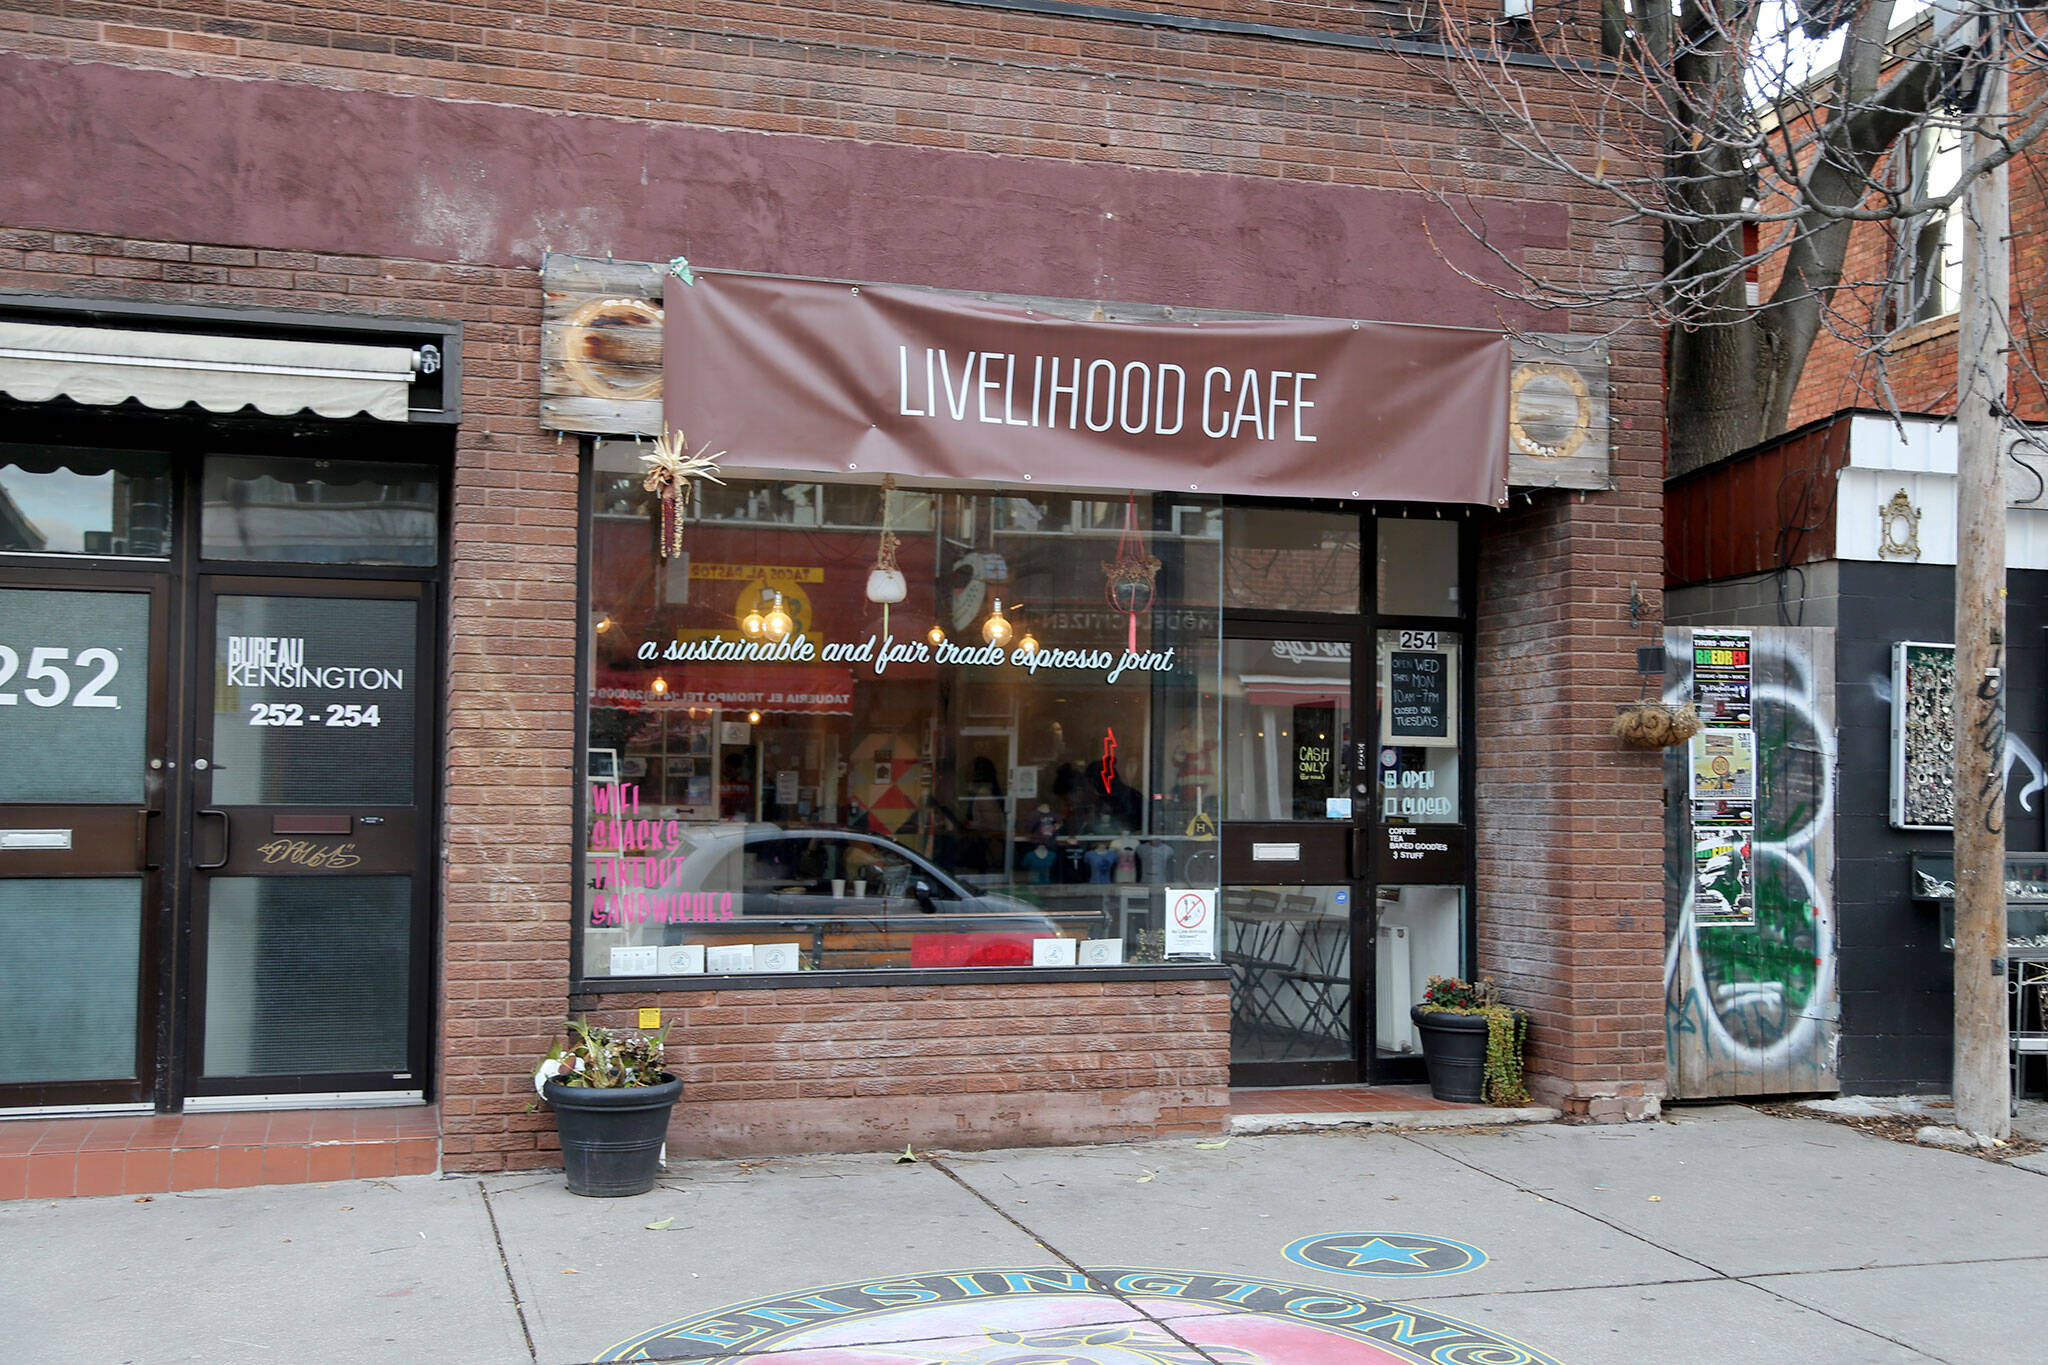 Livelihood Cafe Toronto